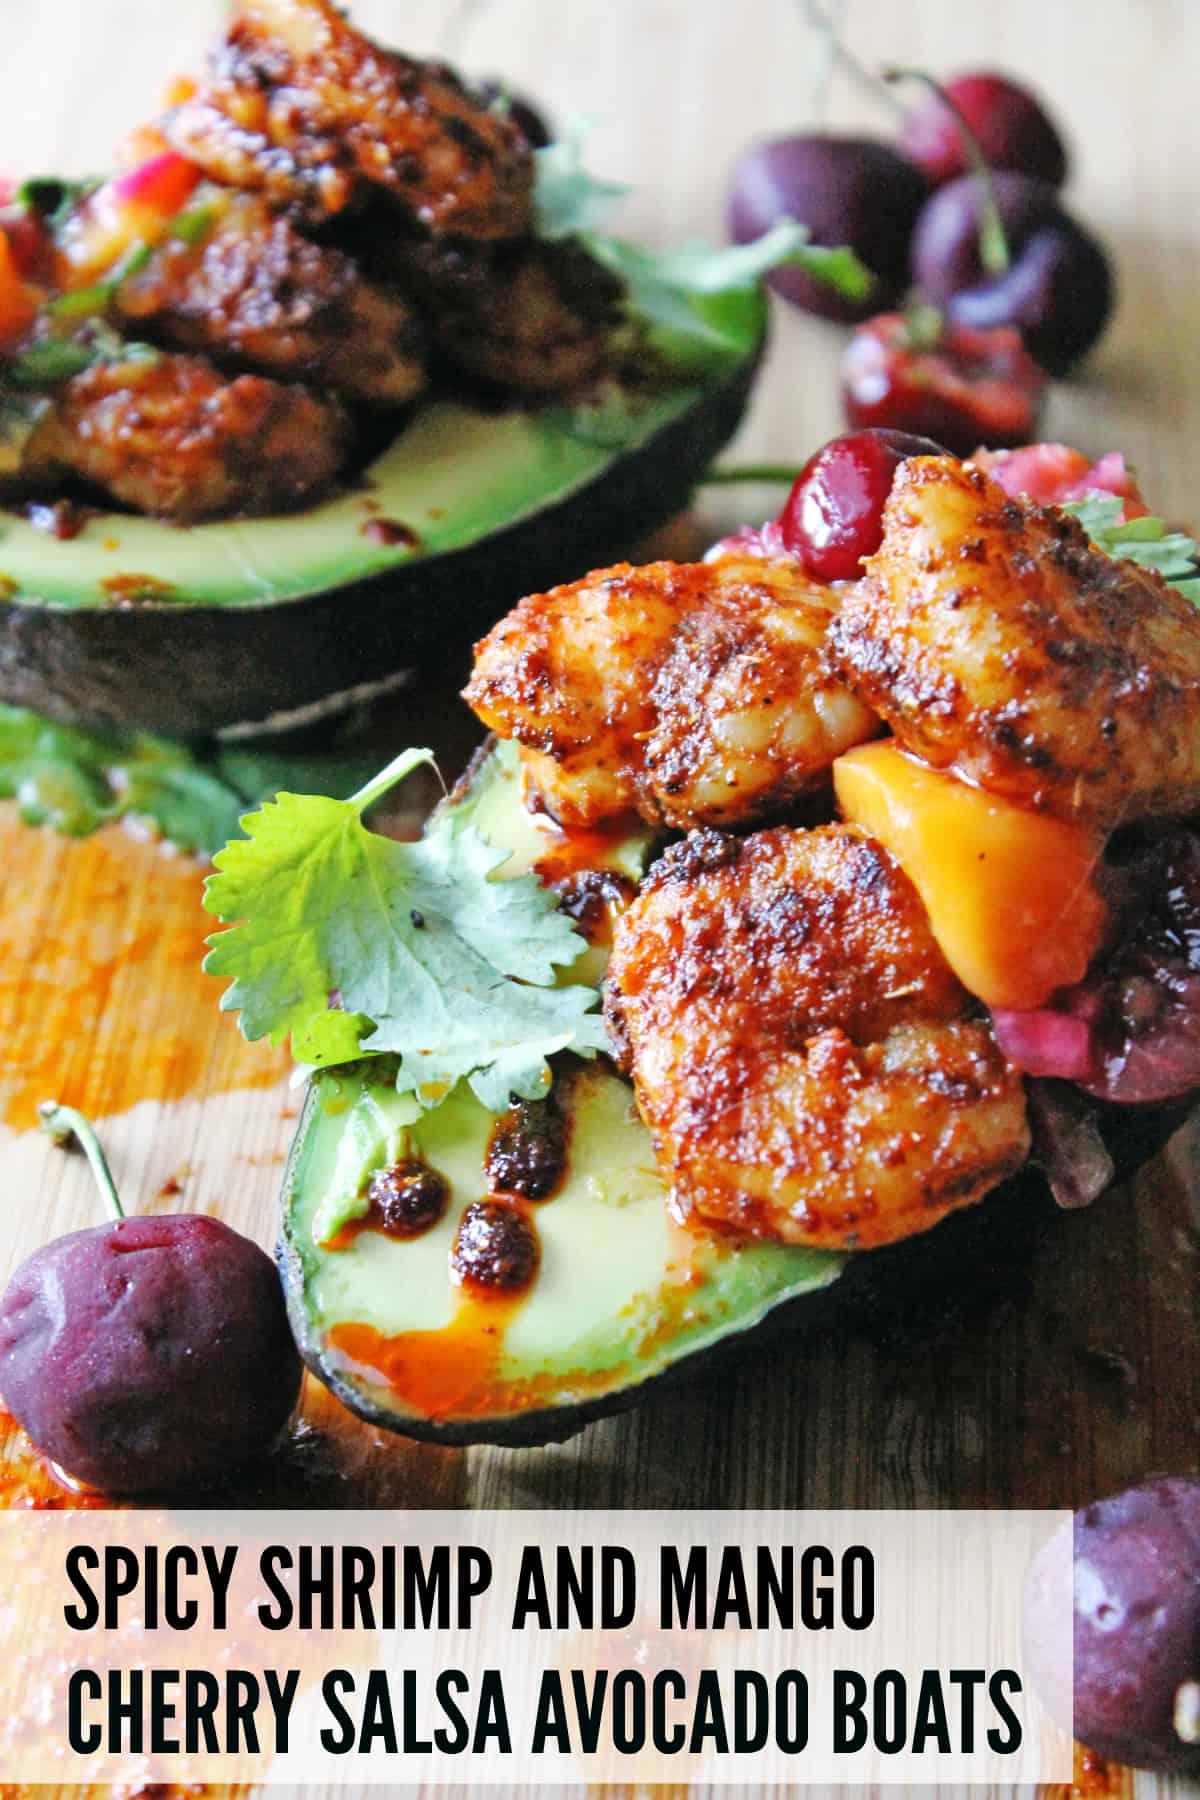 Spicy shrimp and mango cherry salsa avocado boats | Rhubarbarians